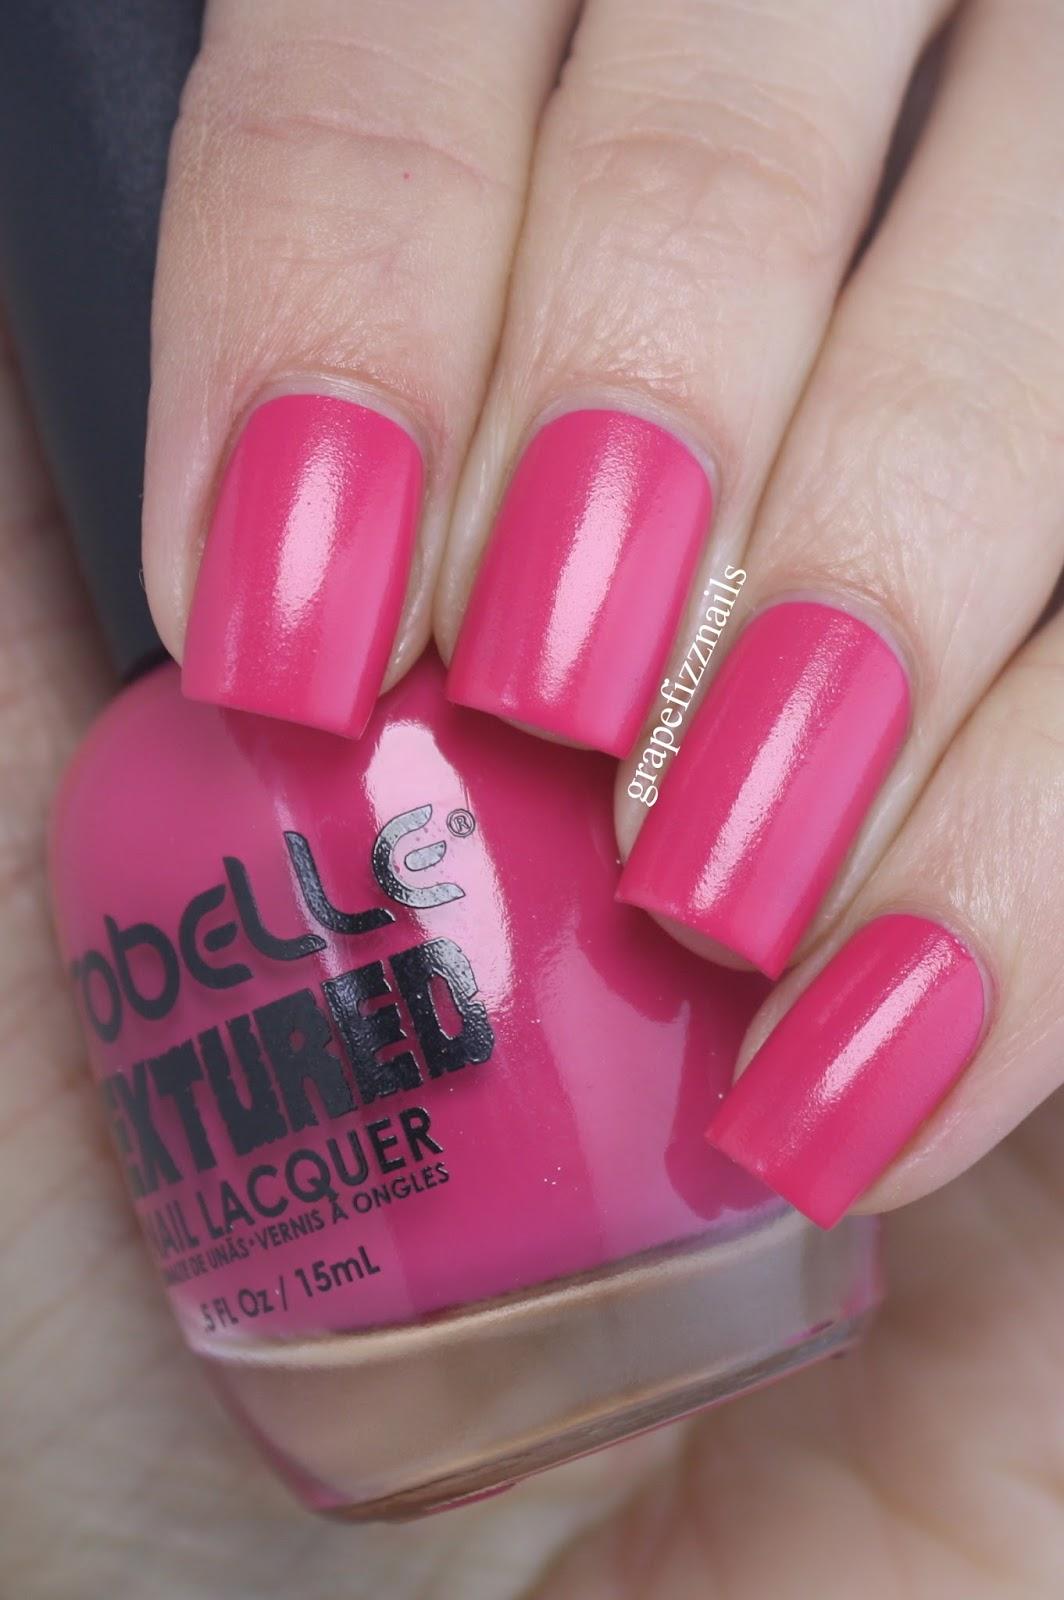 Line Texture On Nails : Grape fizz nails probelle textured nail lacquer